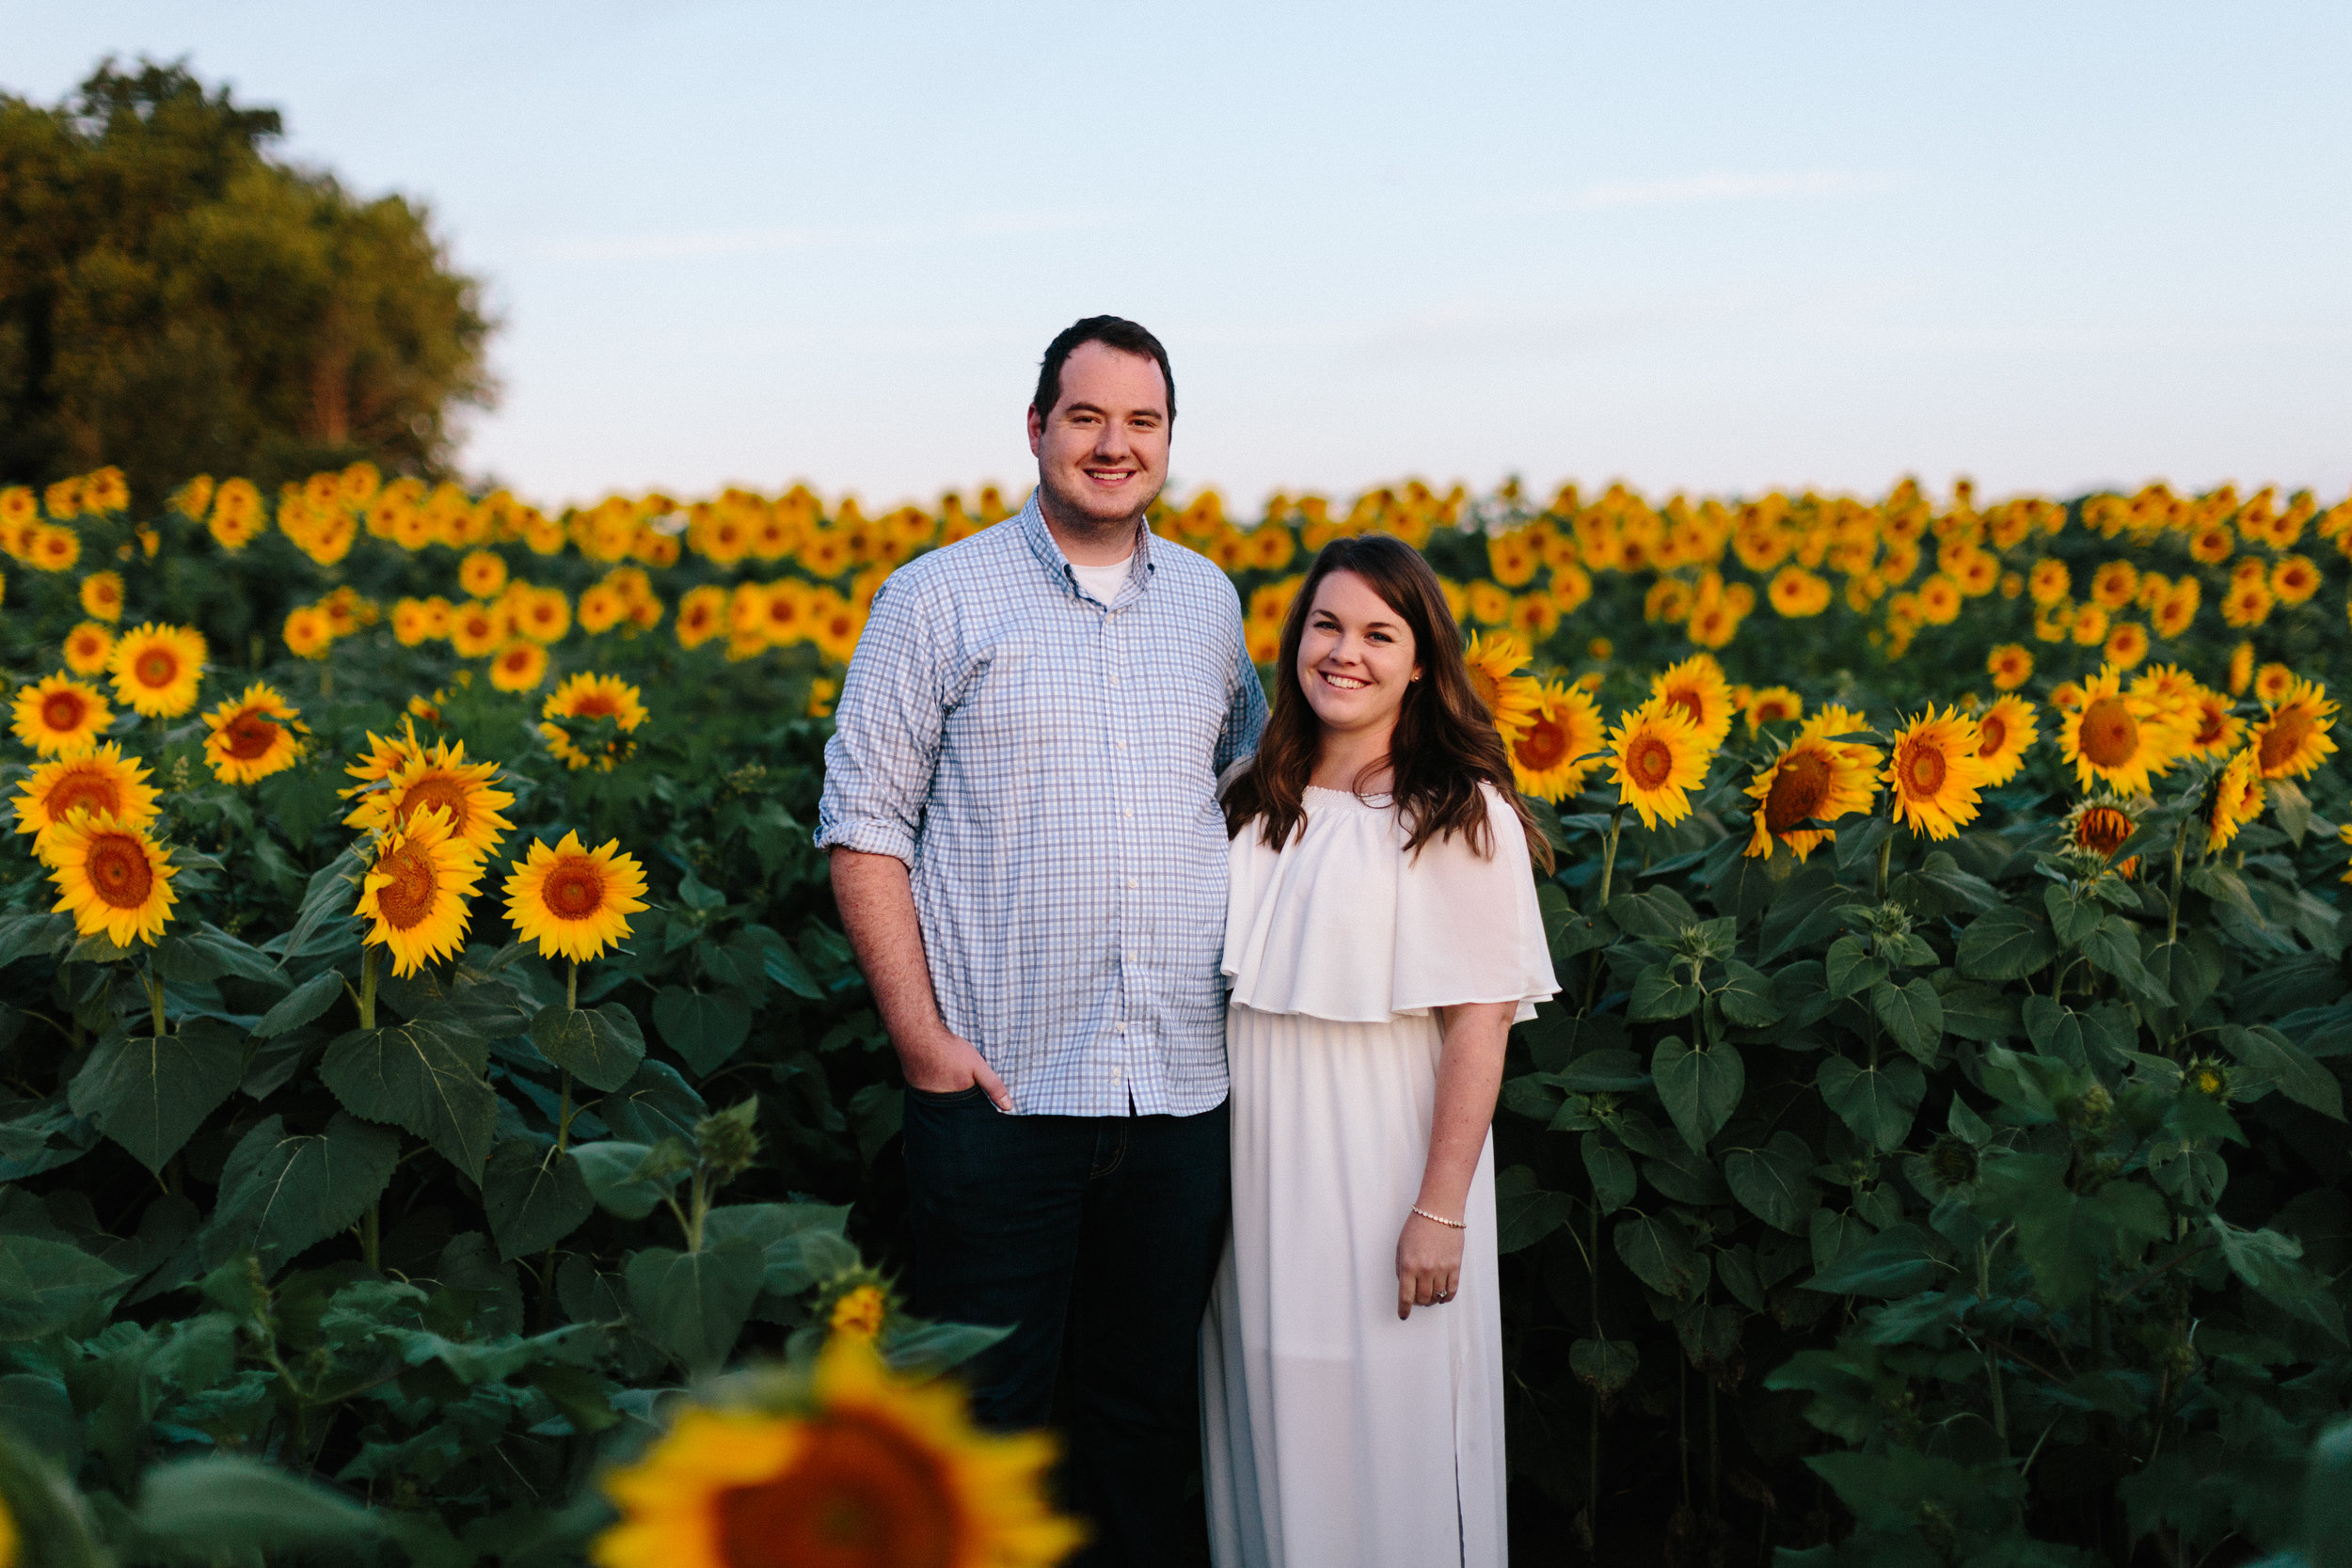 alyssa barletter photography sunflower field photos-1.jpg